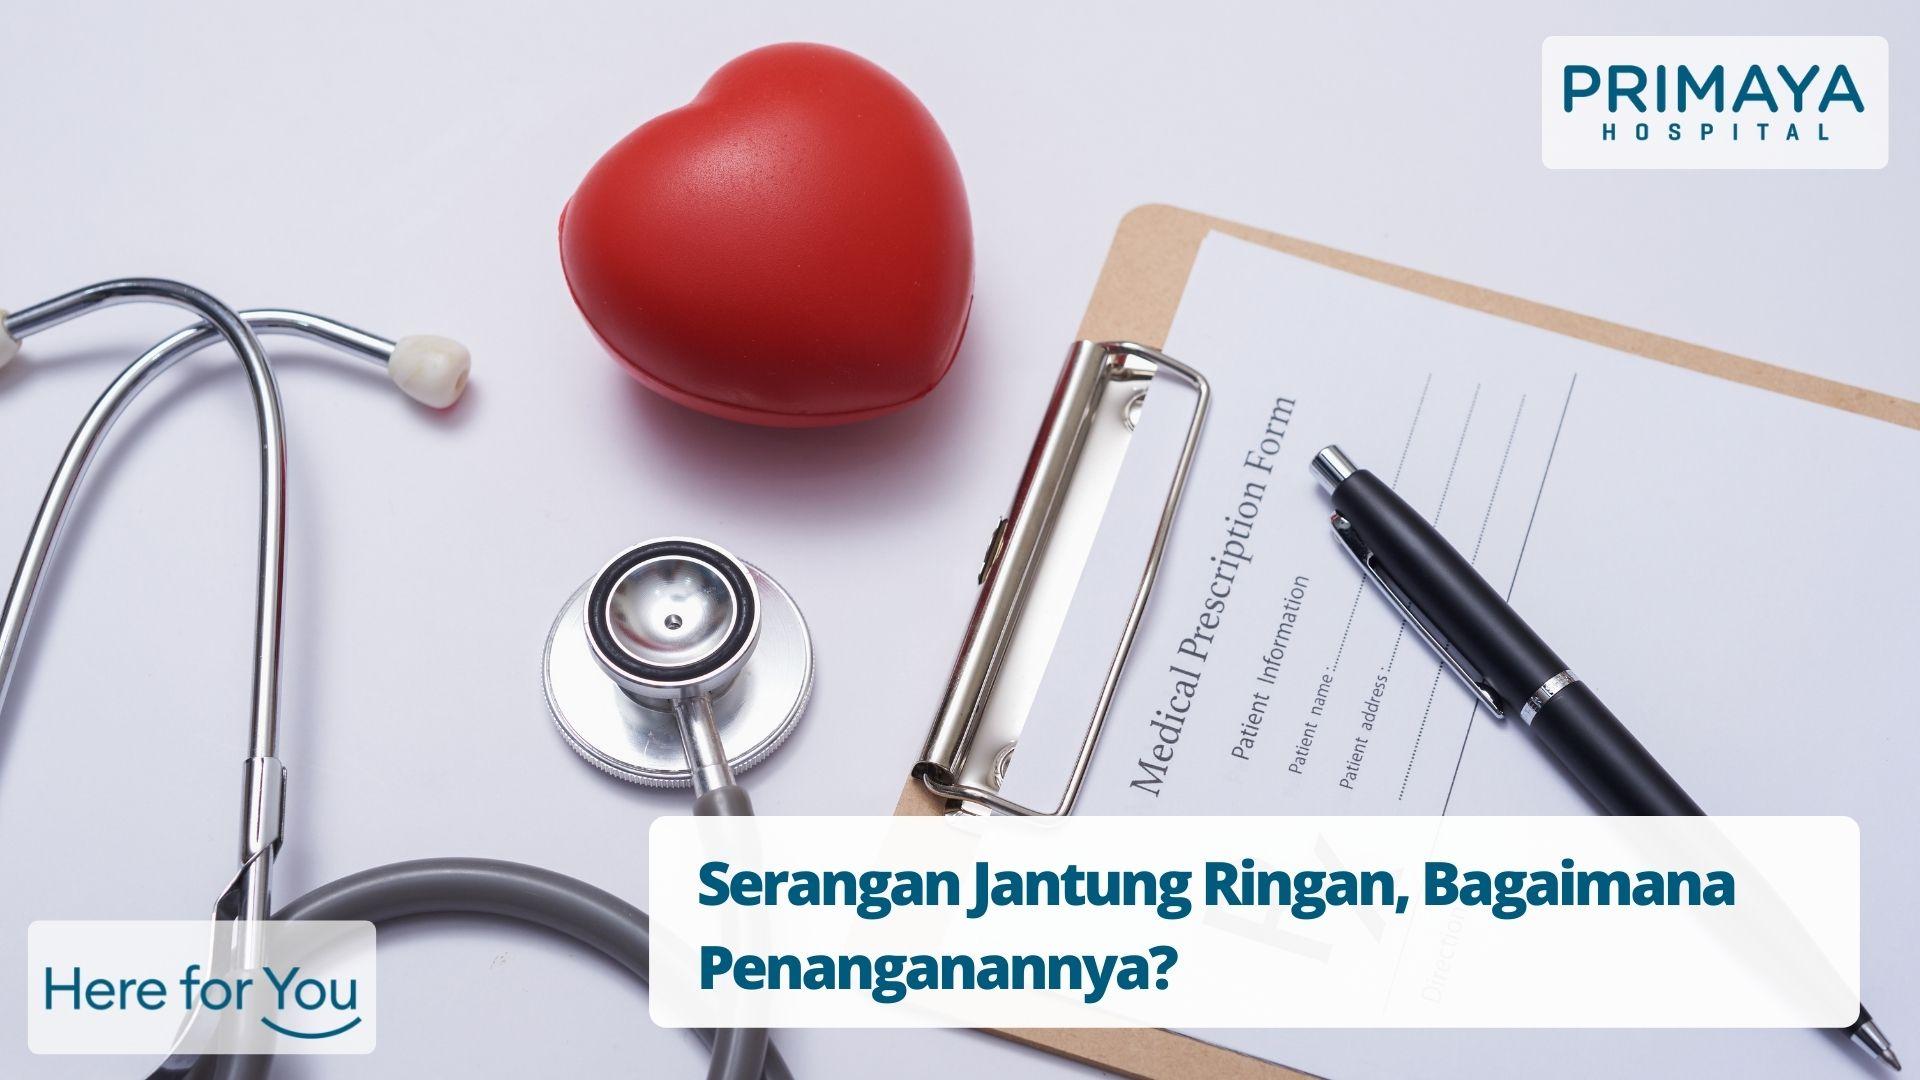 Serangan Jantung Ringan, Bagaimana Penanganannya?